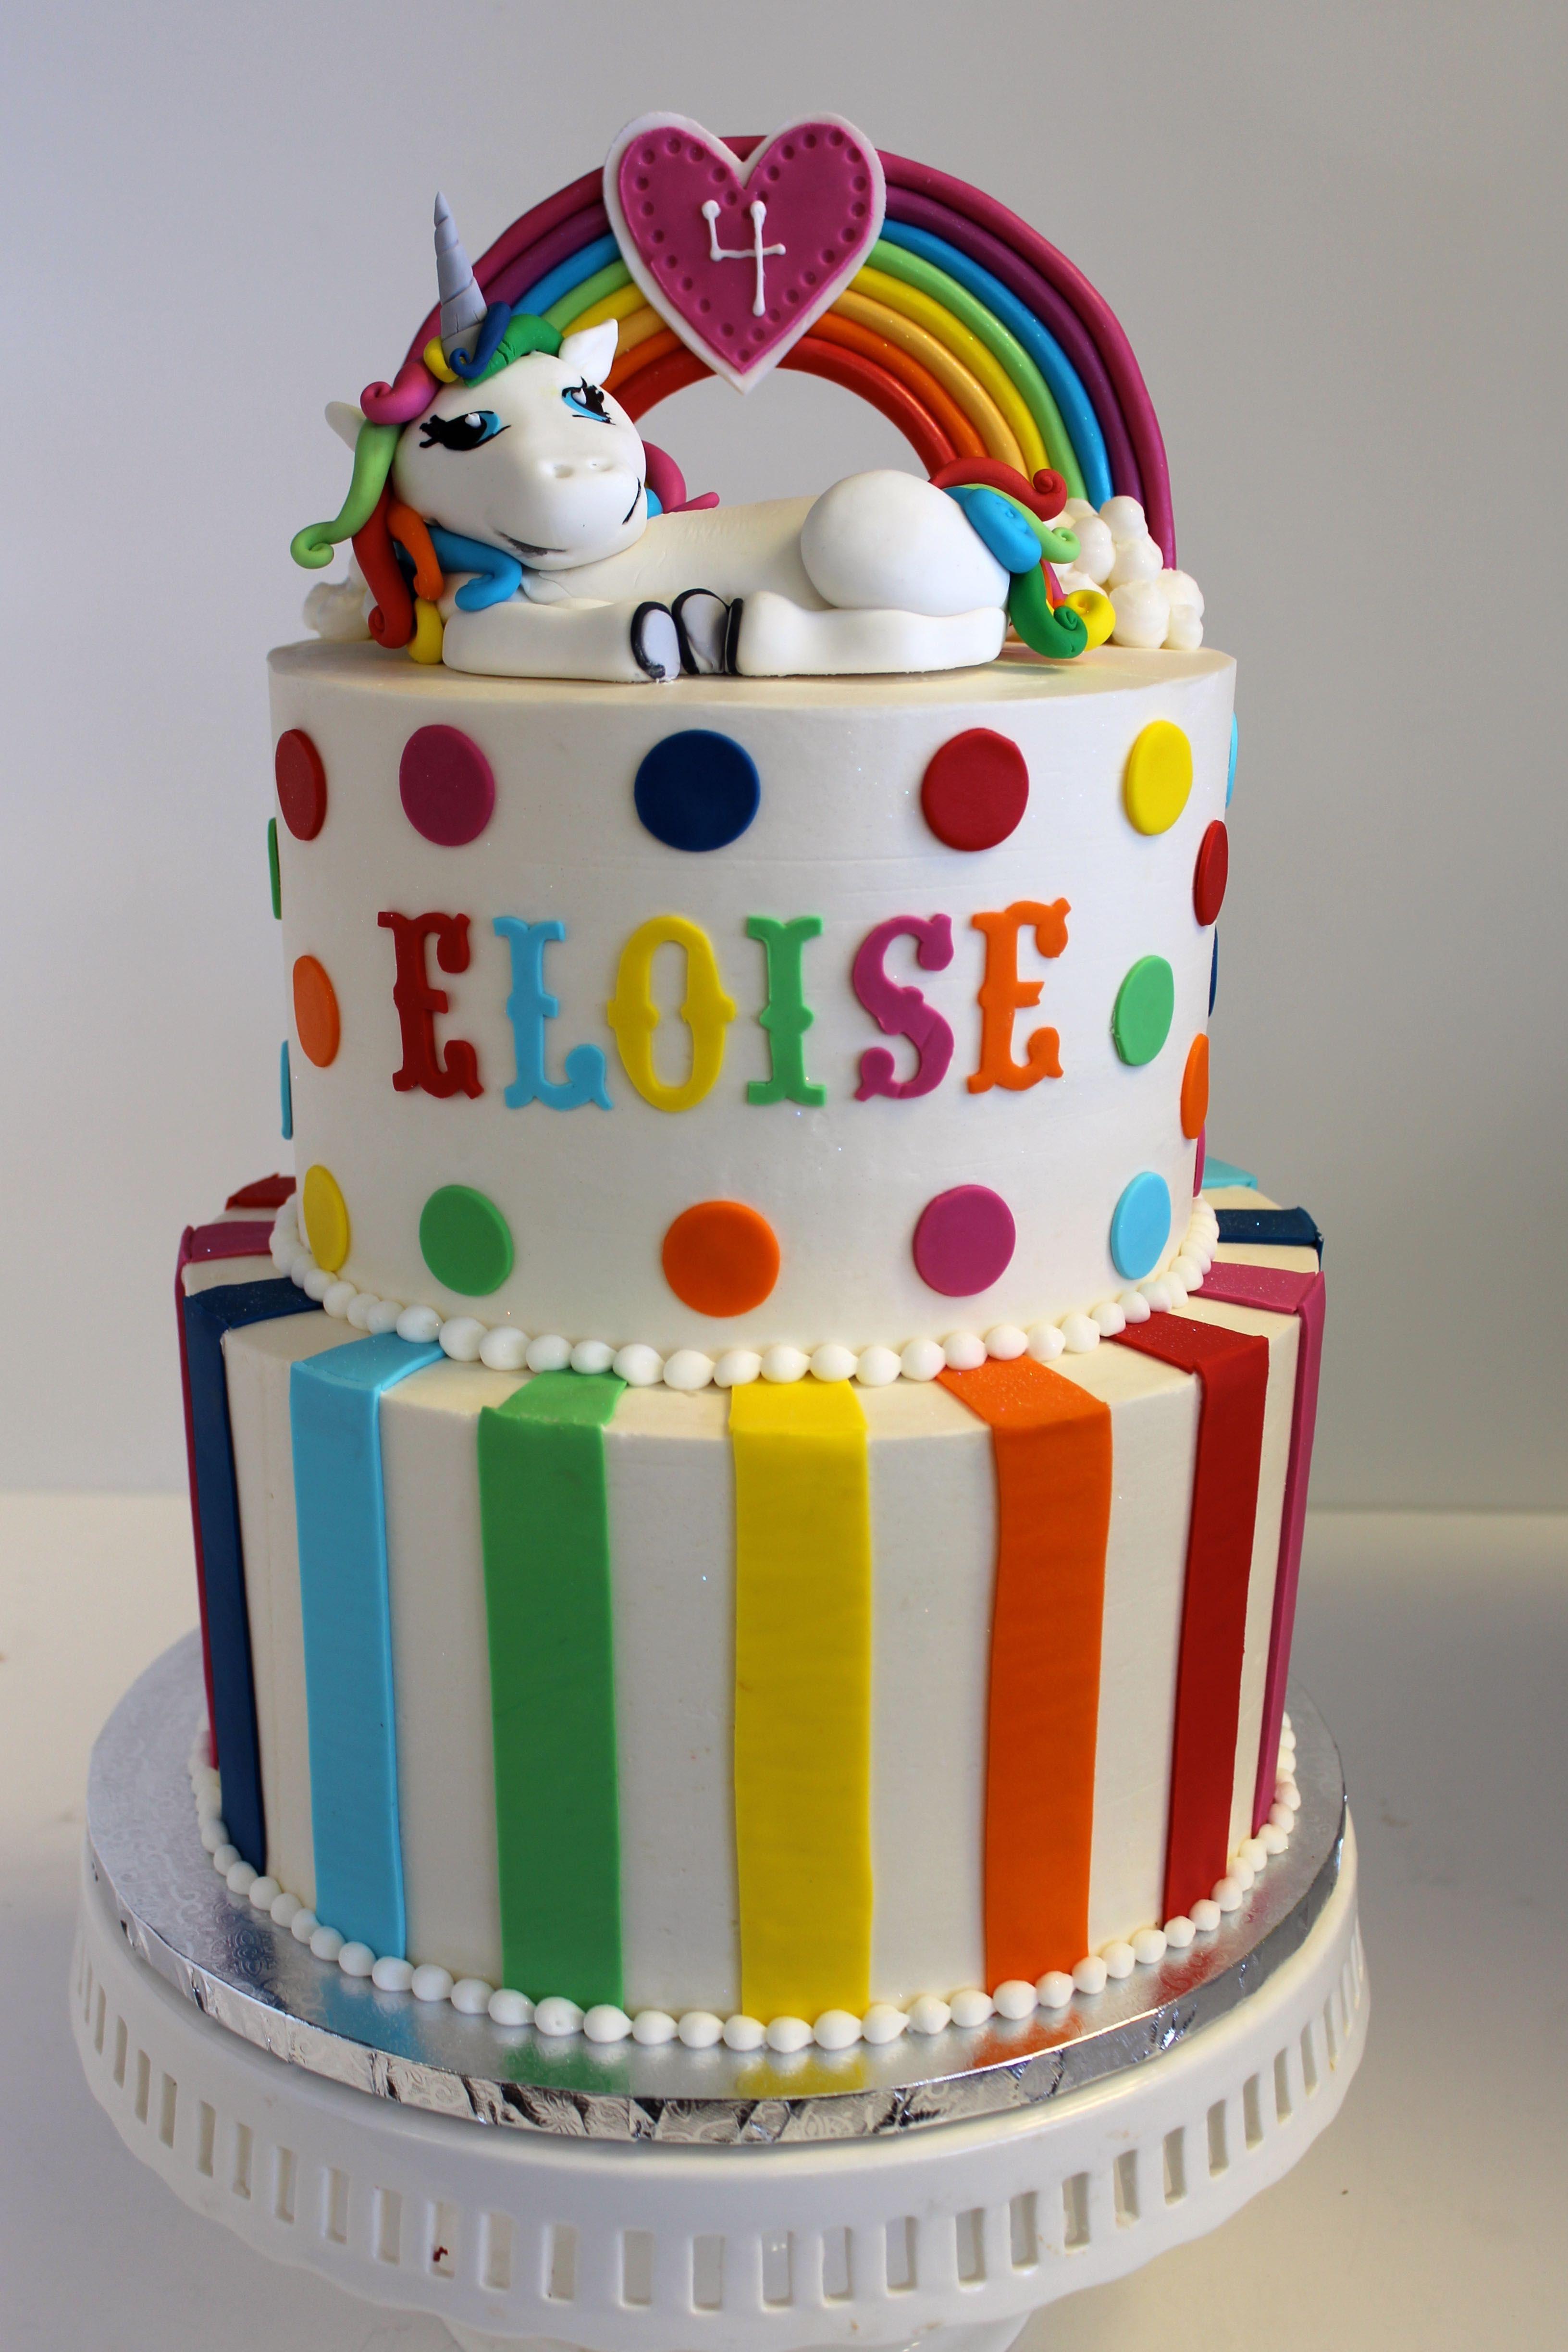 Happy birthday to eloise rainbows unicorns lisafrank